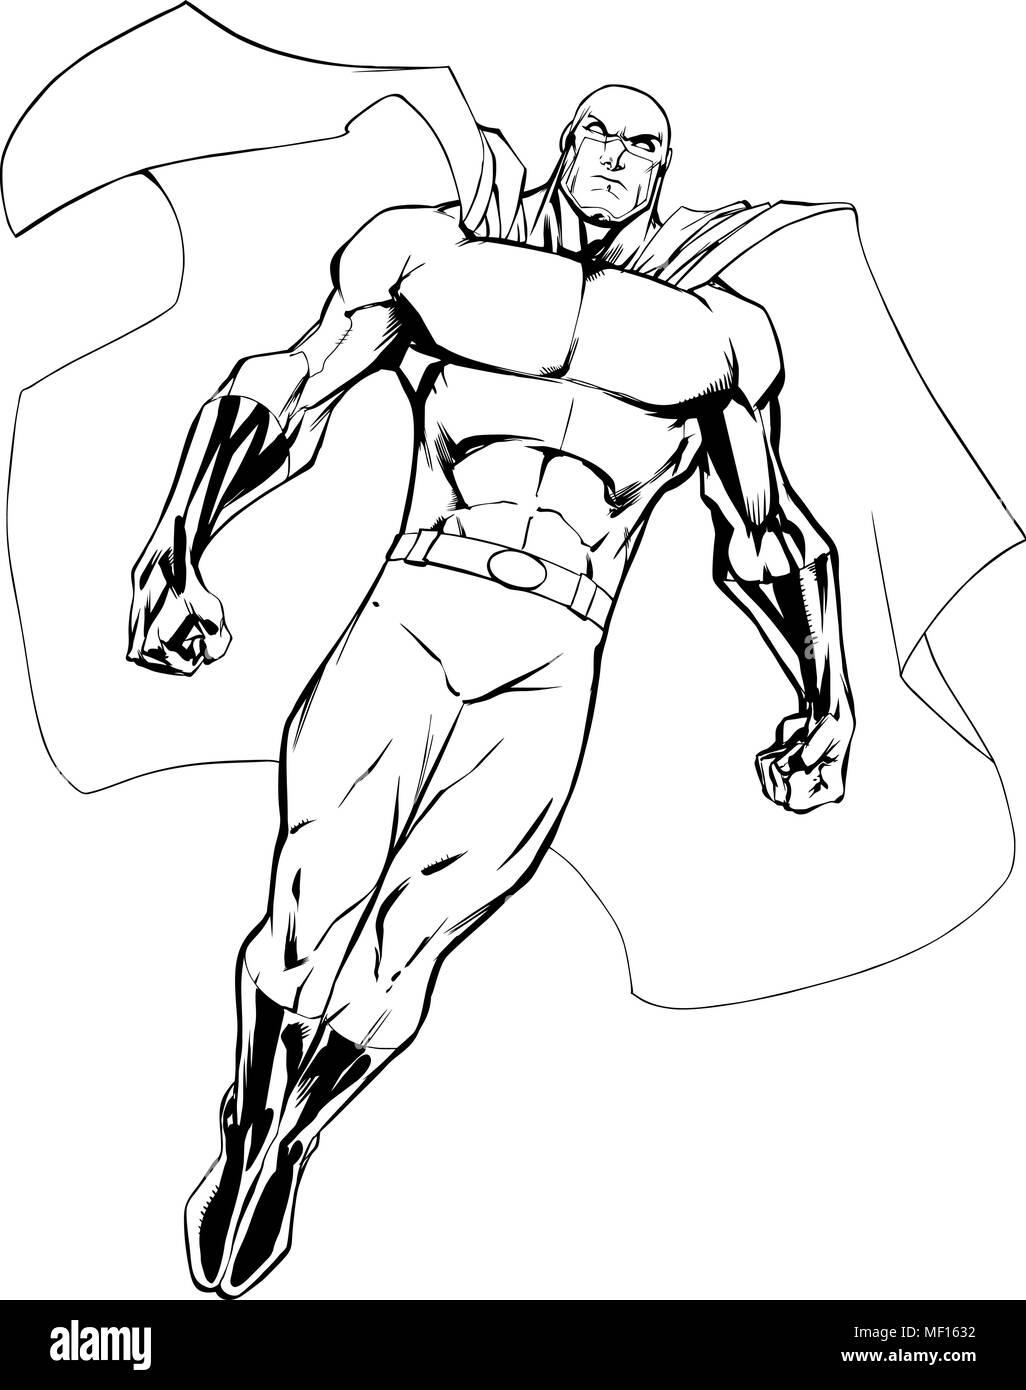 Superhero Cape Art Stock Vector Images